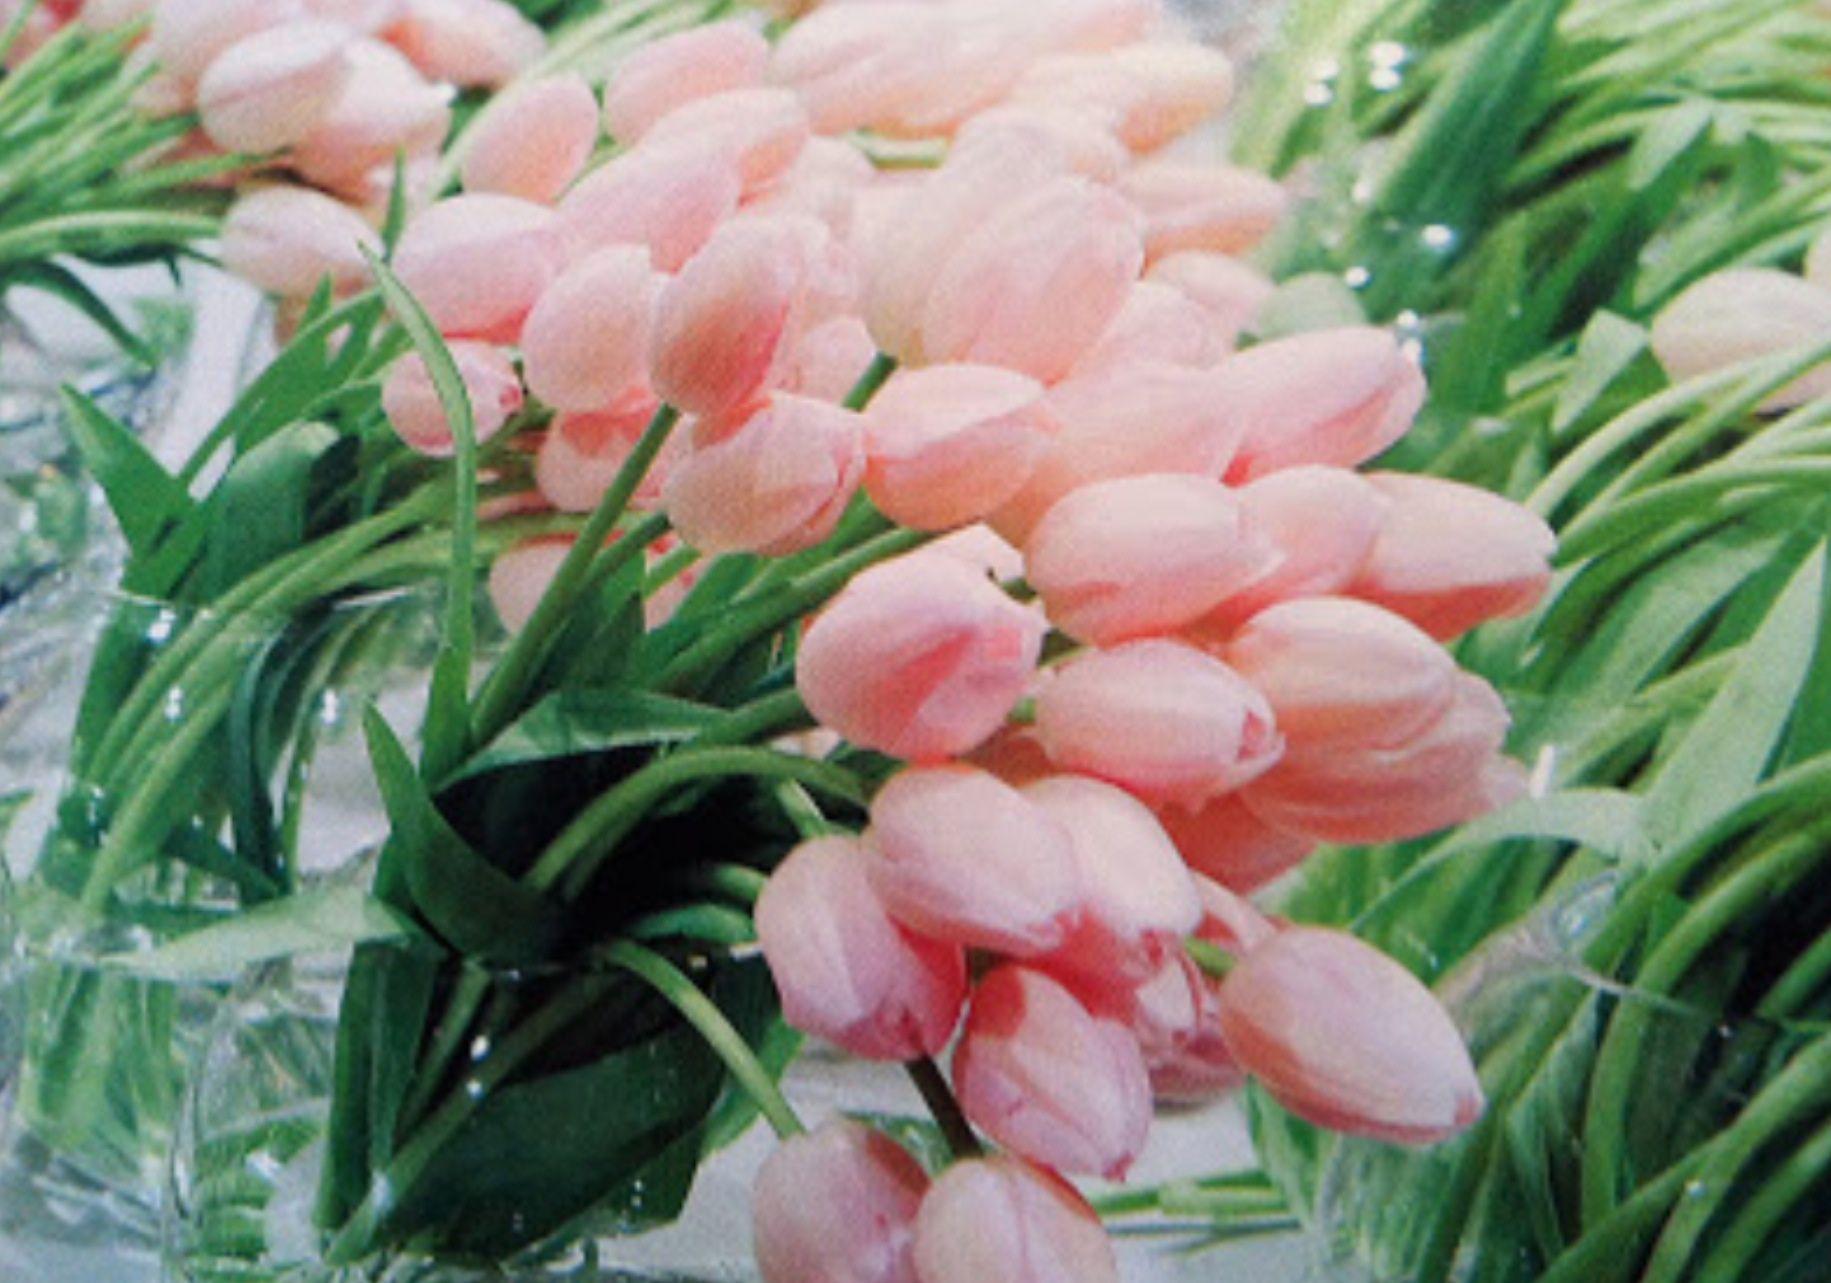 pale pink tulips - grandiflora celebrations